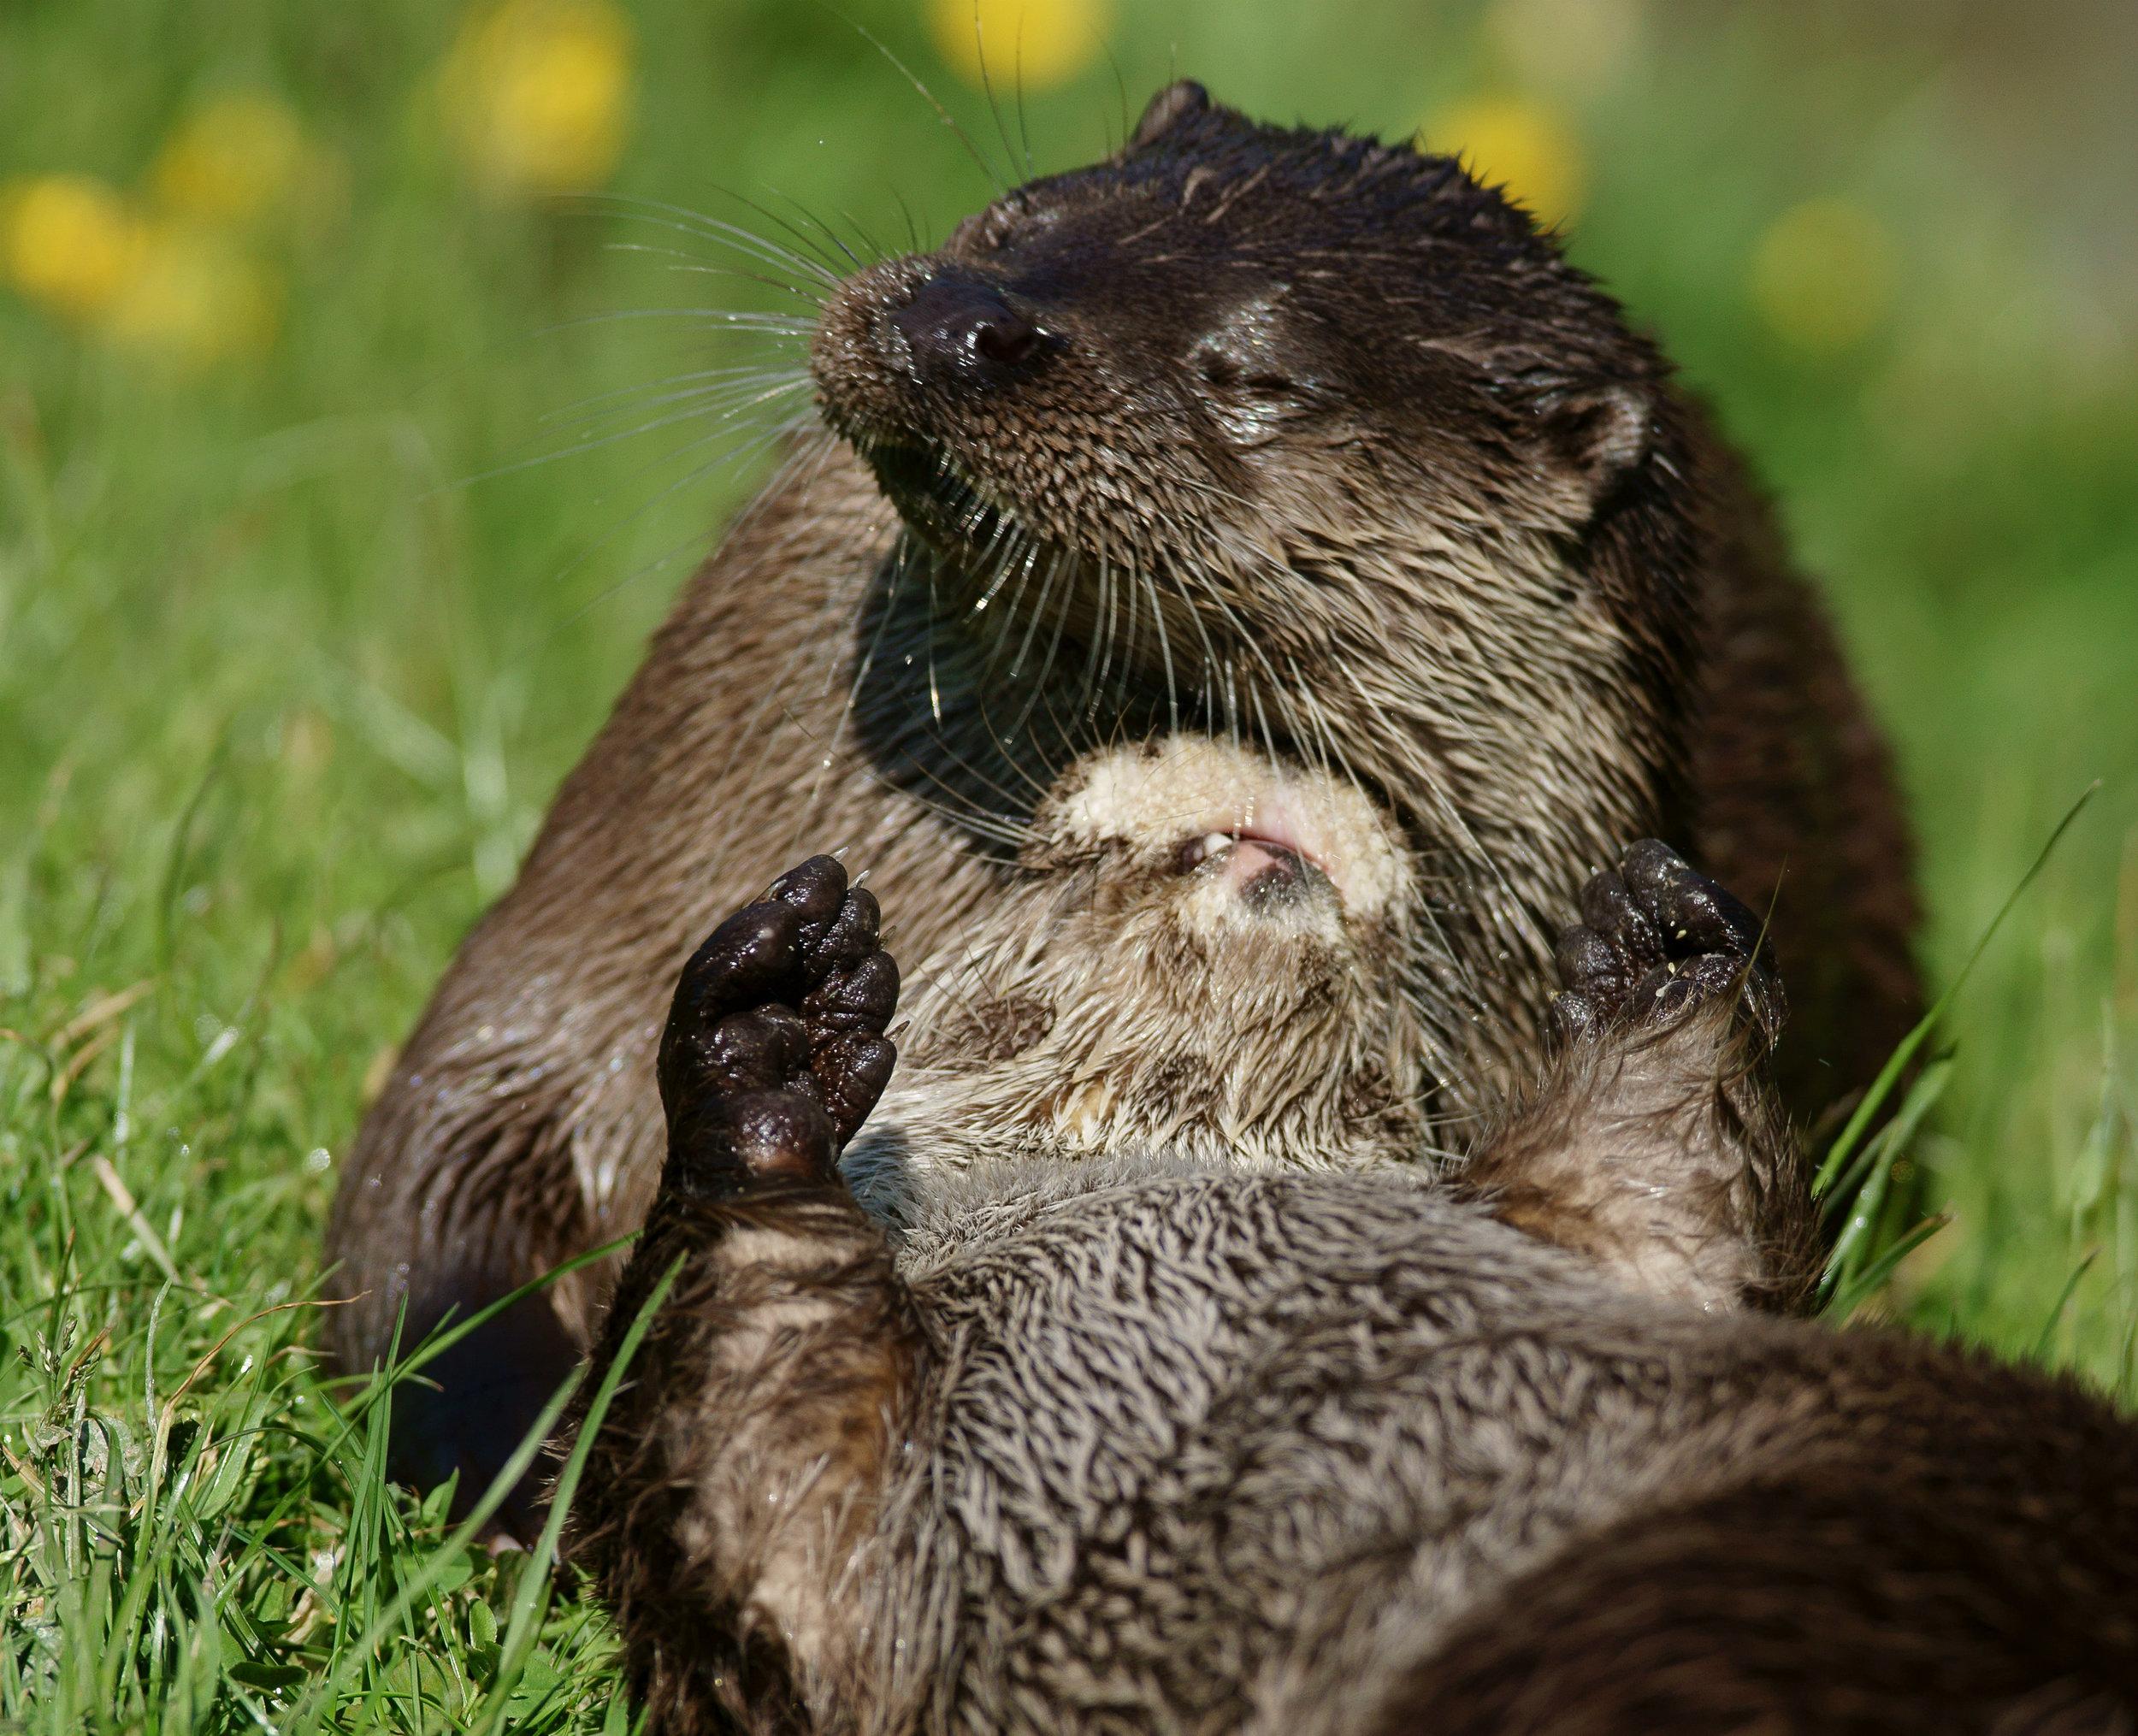 Otter Gives Her Friend a Nice, Relaxing Scalp Massage